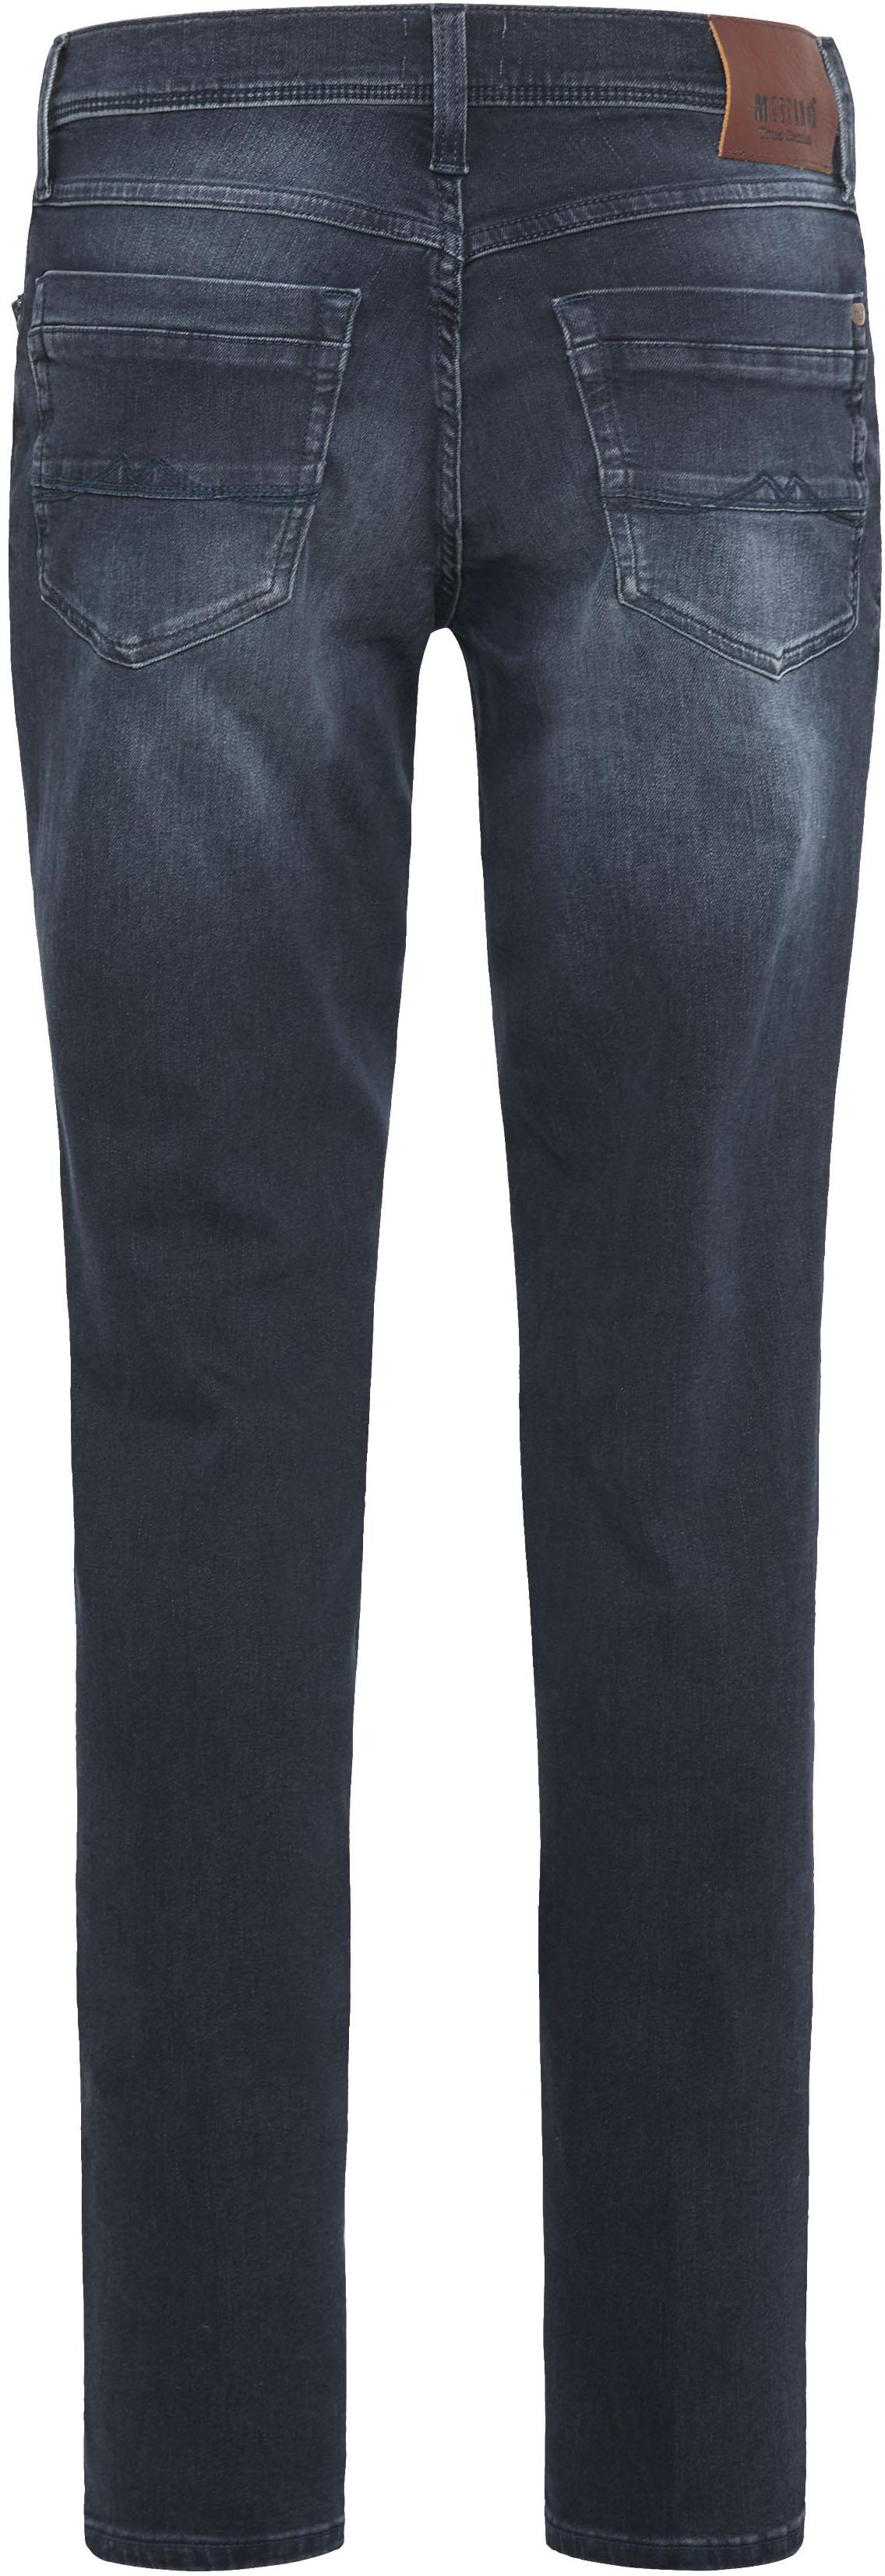 mustang -  5-Pocket-Jeans WASHINGTON